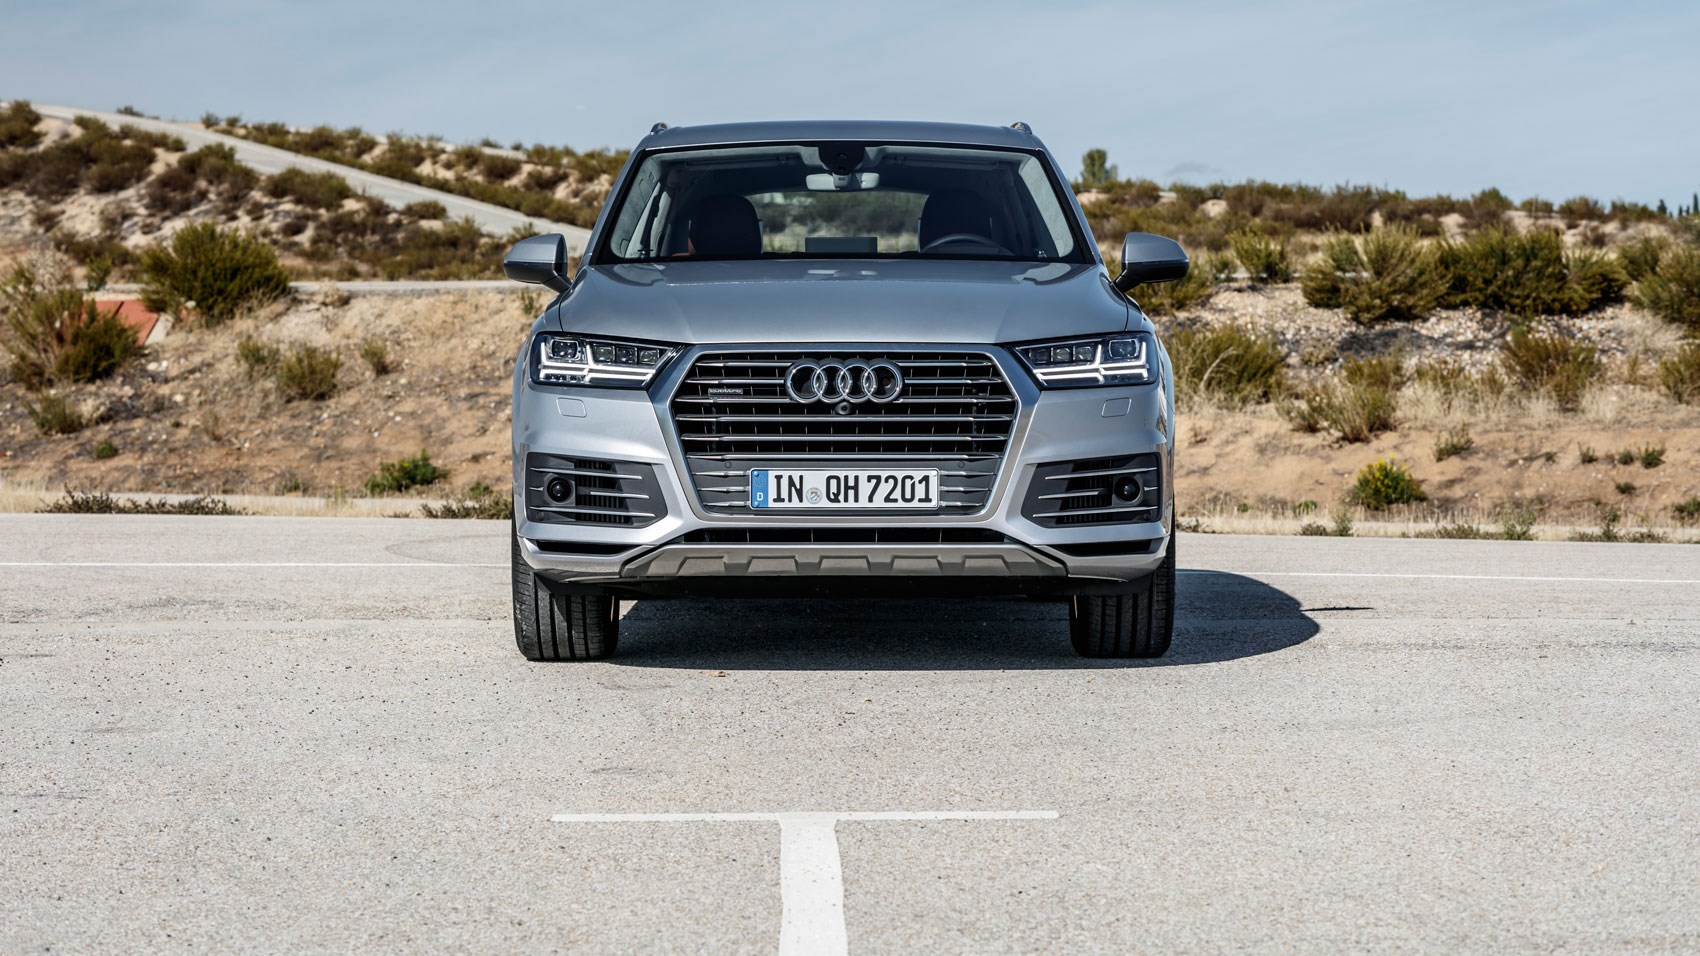 Audi A3 E Tron Lease >> Audi Q7 e-tron (2016) plug-in hybrid review | CAR Magazine